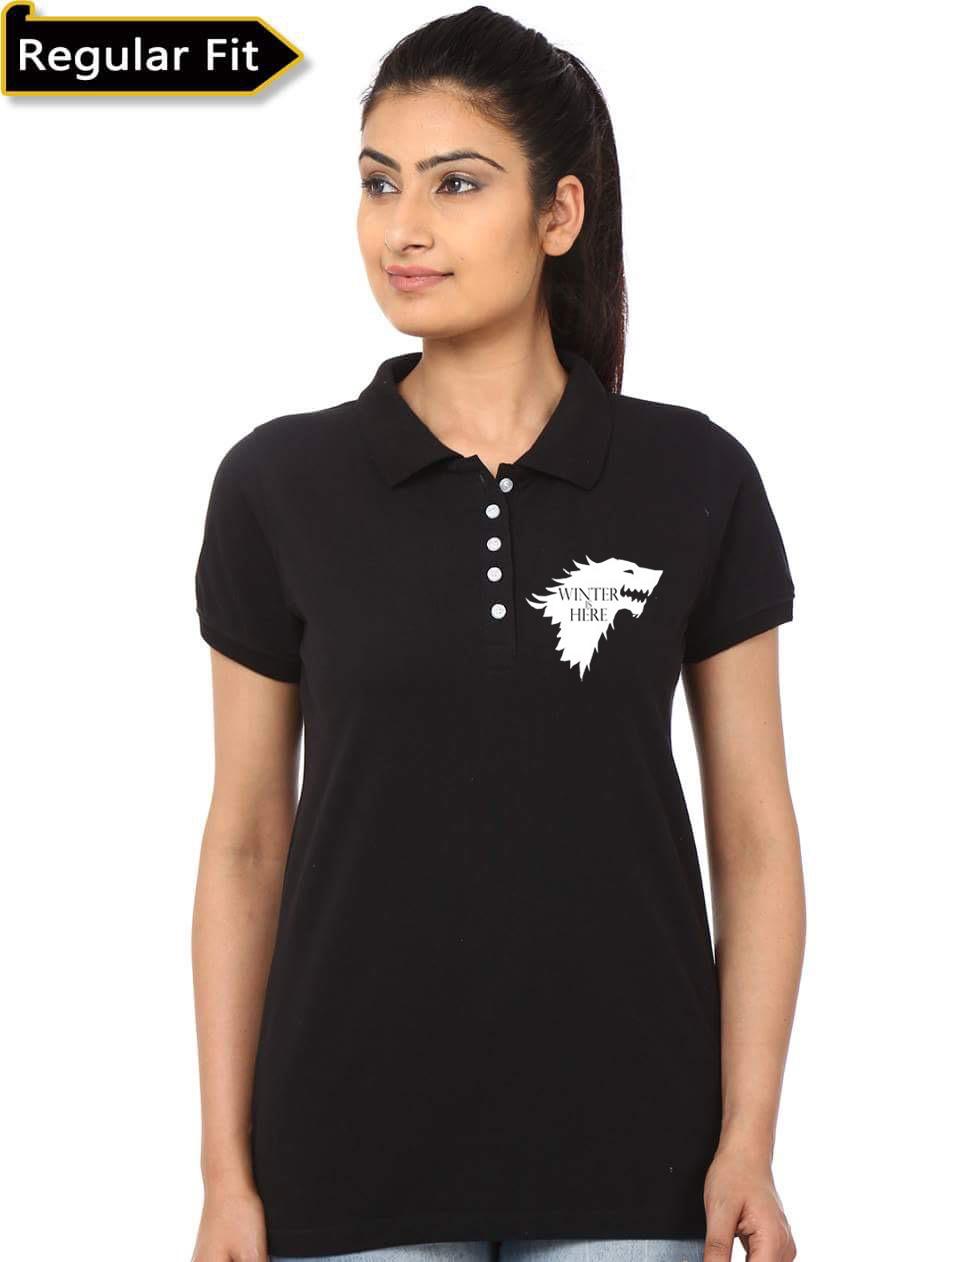 Home   Uncategorized   Winter Is Here Girls Polo T-Shirt ef6b86820